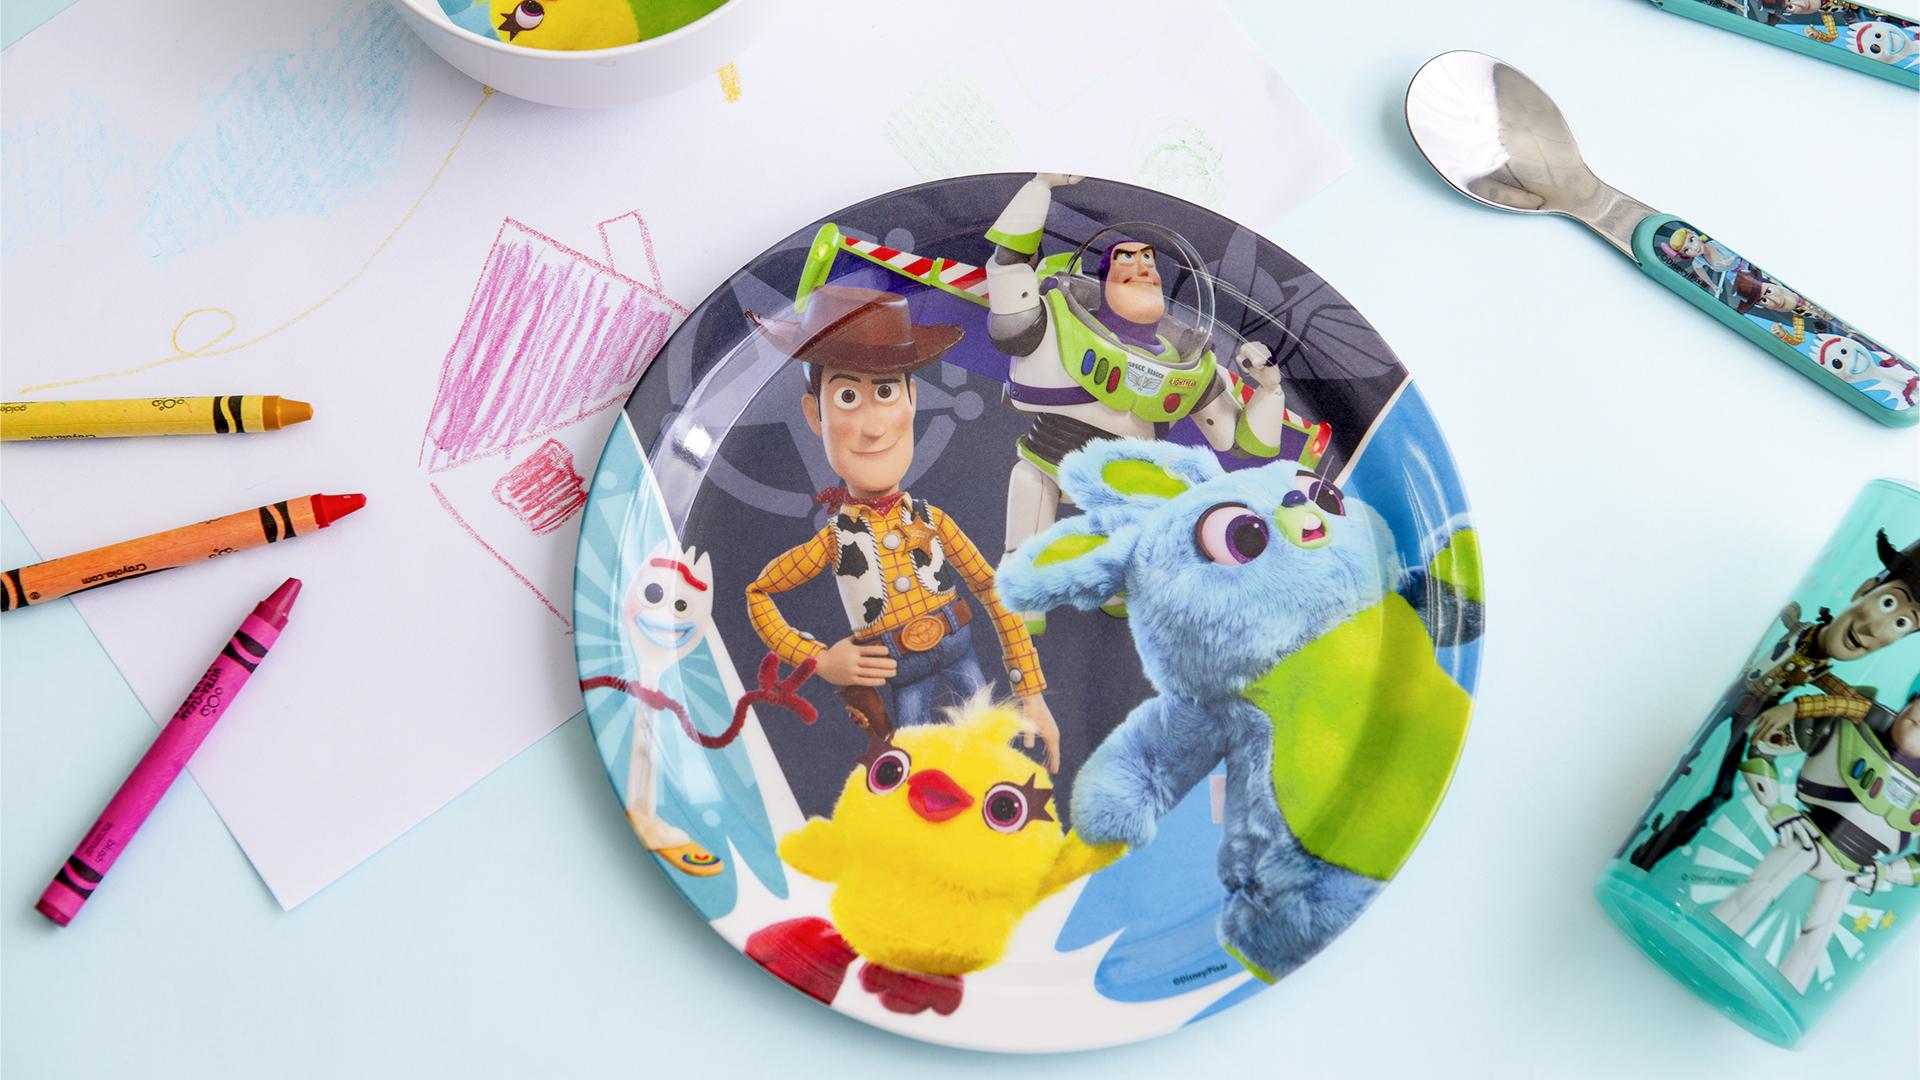 Disney Pixar Dinnerware Set, Woody, Buzz and Friends, 5-piece set slideshow image 2